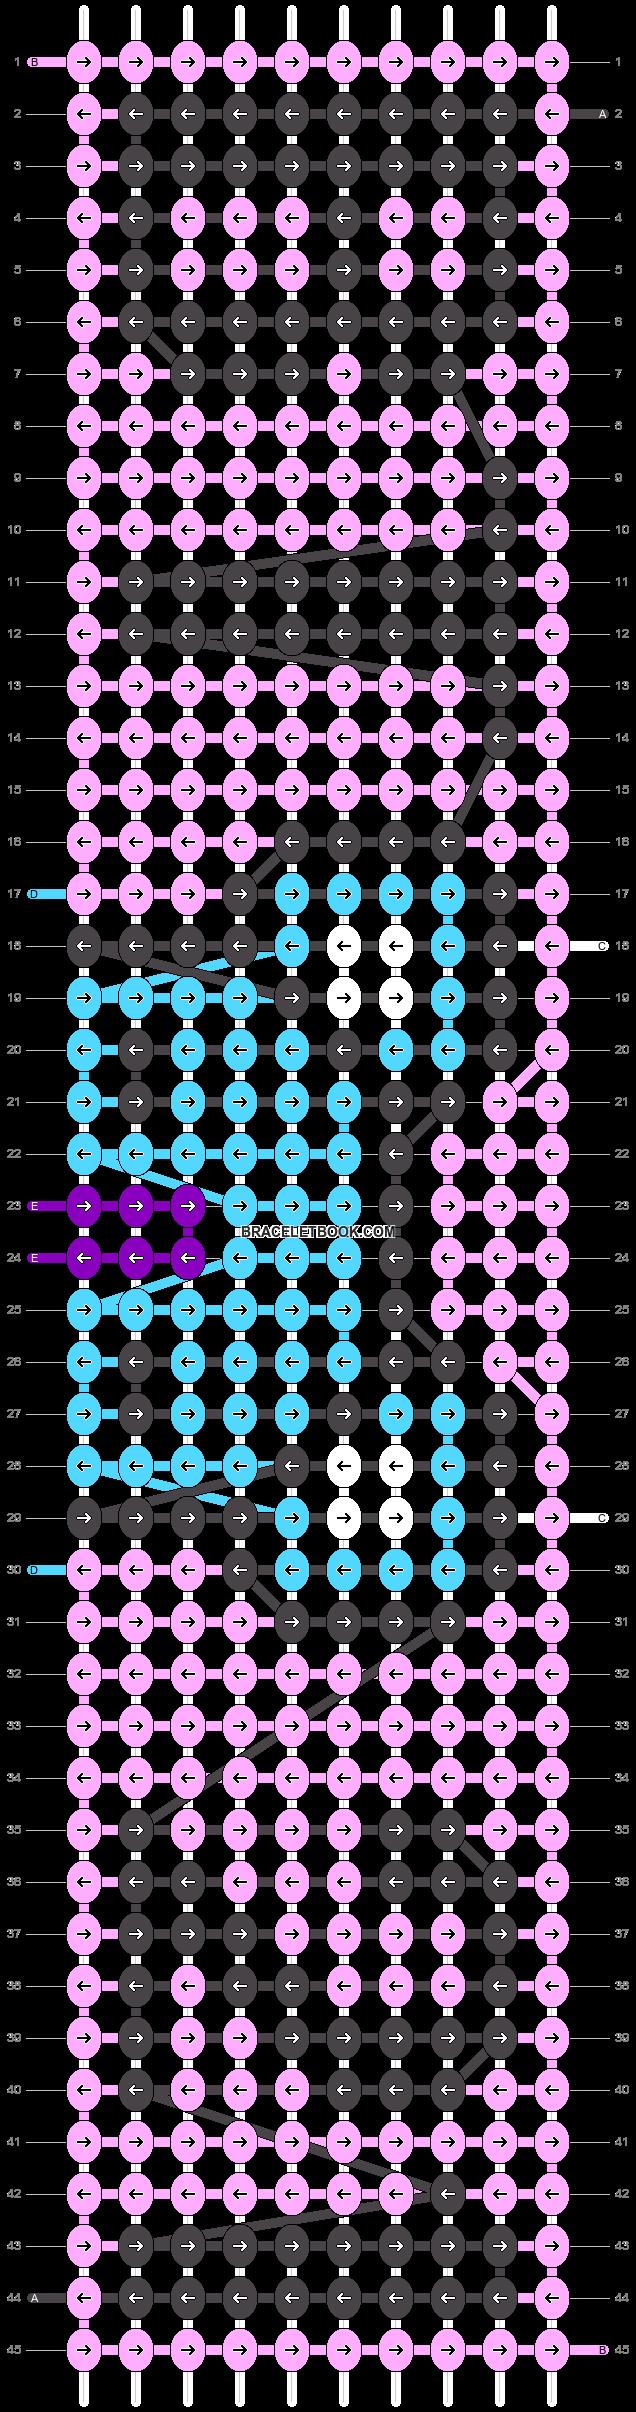 Alpha pattern #33369 pattern